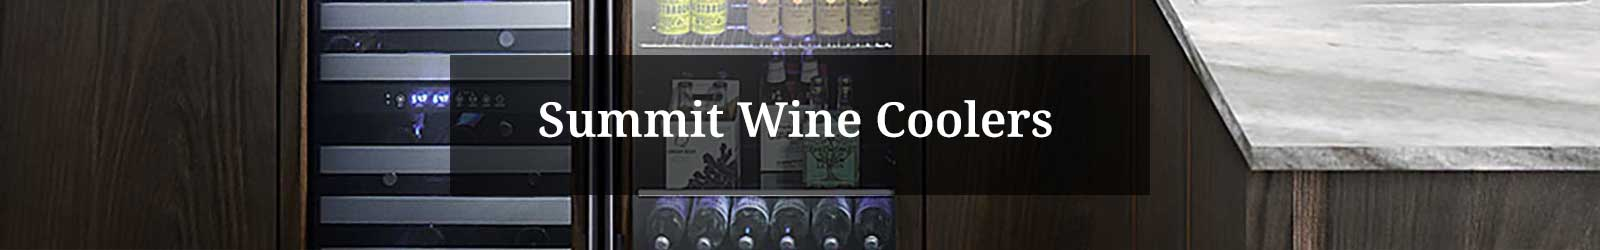 Professional Summit Wine Coolers